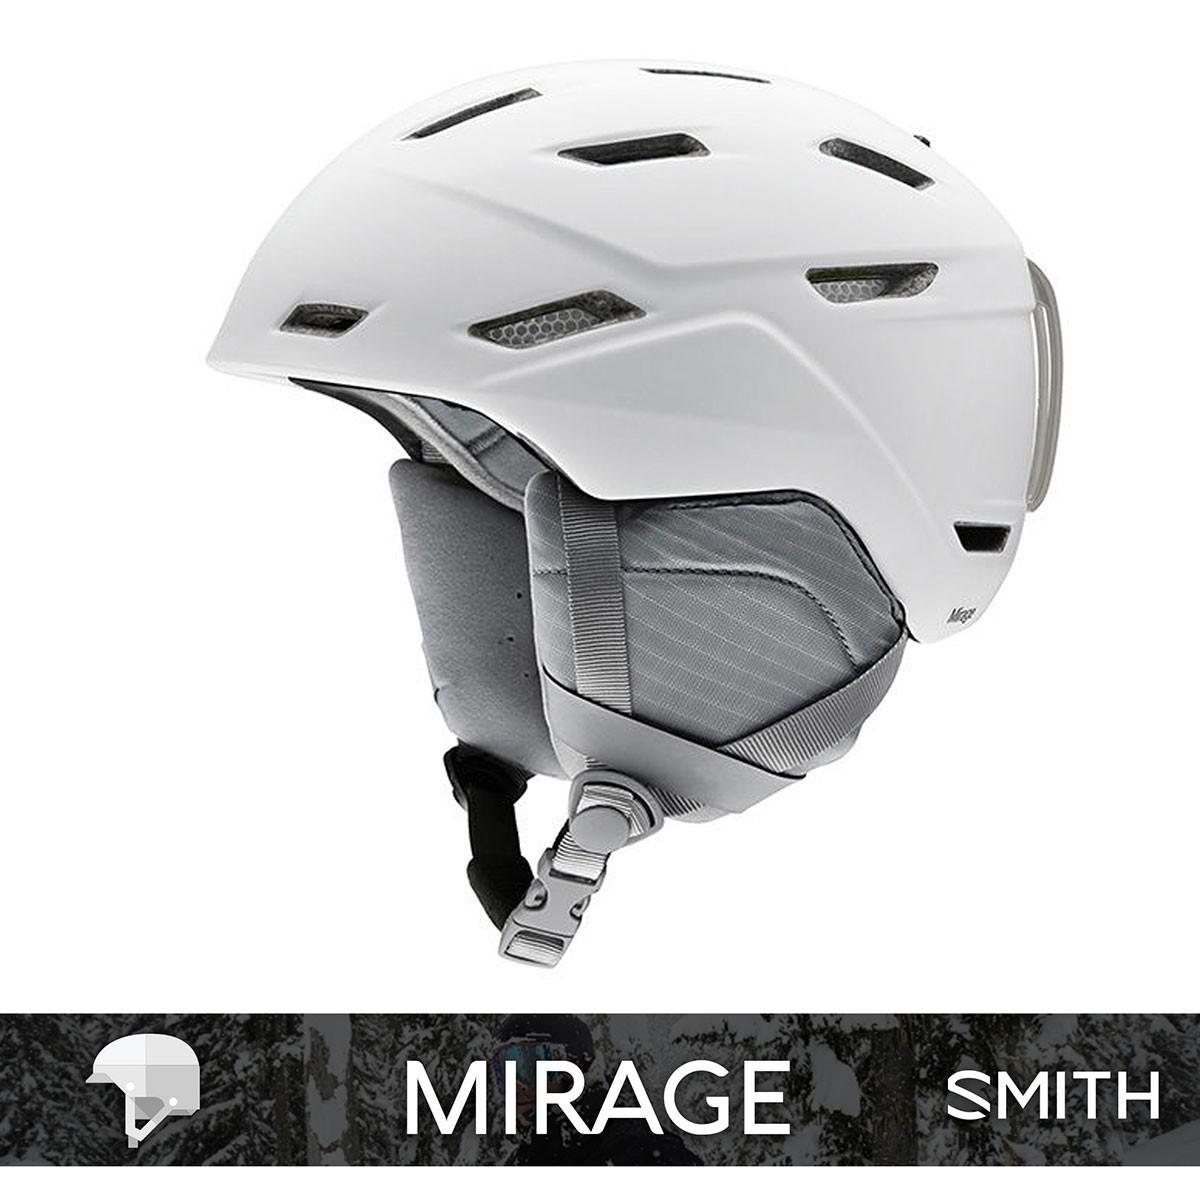 SMITH MIRAGE matte white - Изображение - AQUAMATRIX